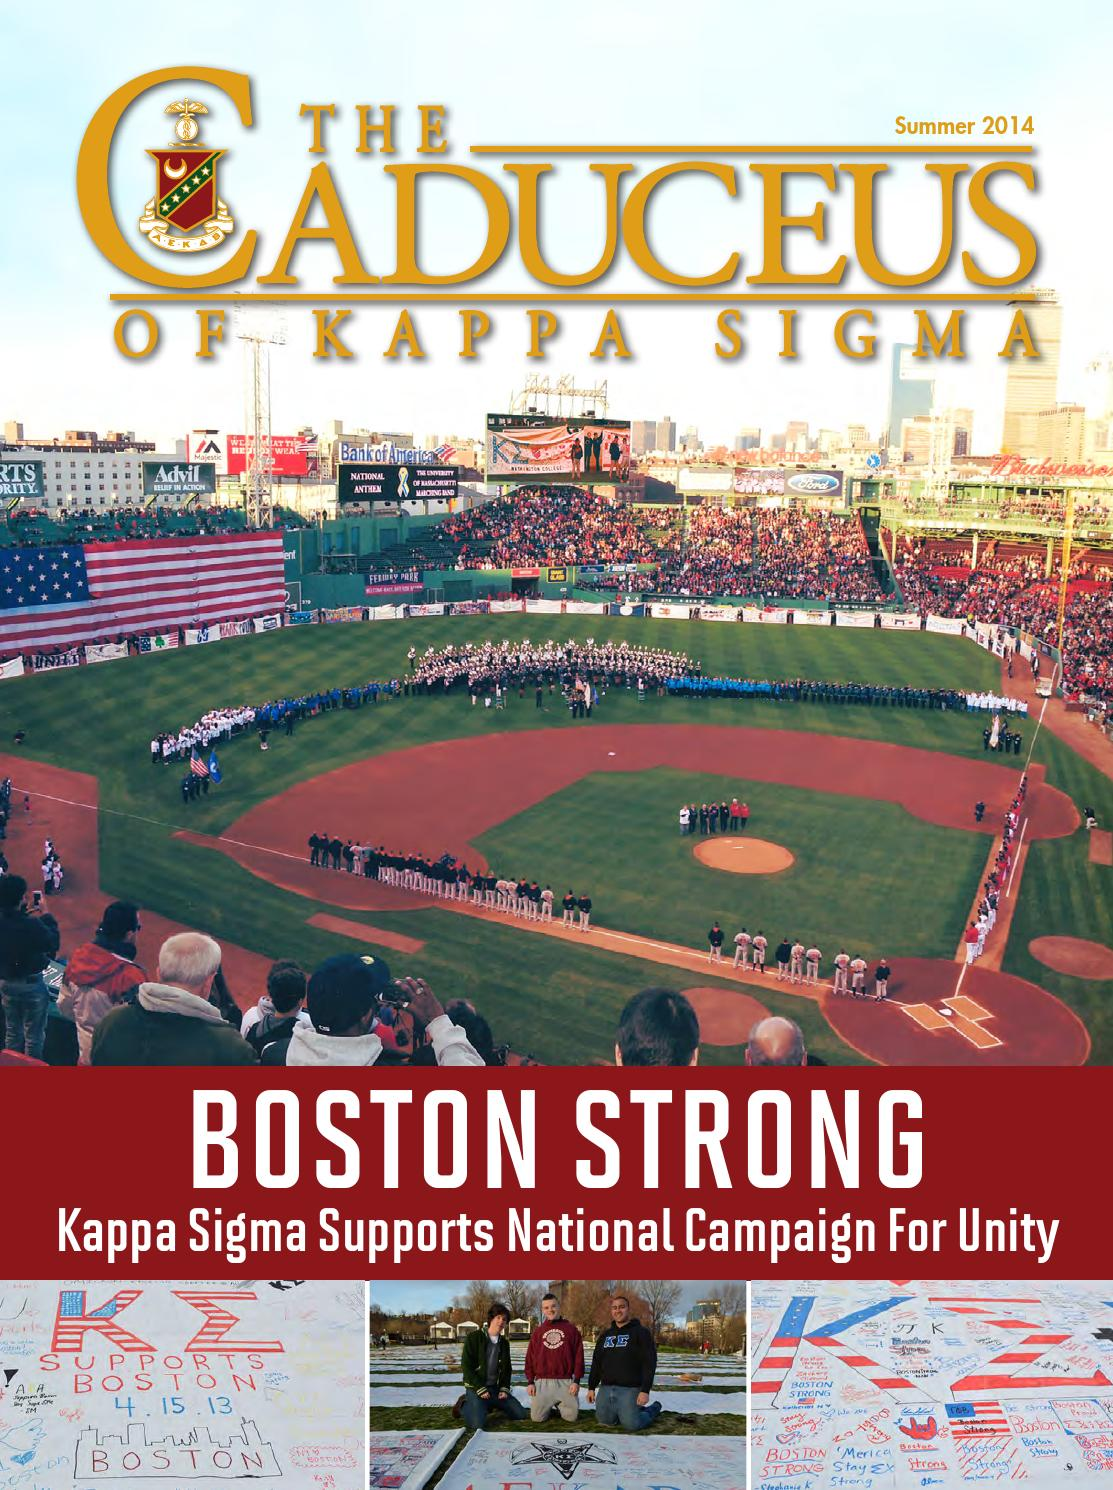 The Caduceus of Kappa Sigma - Summer 2014 by Kappa Sigma